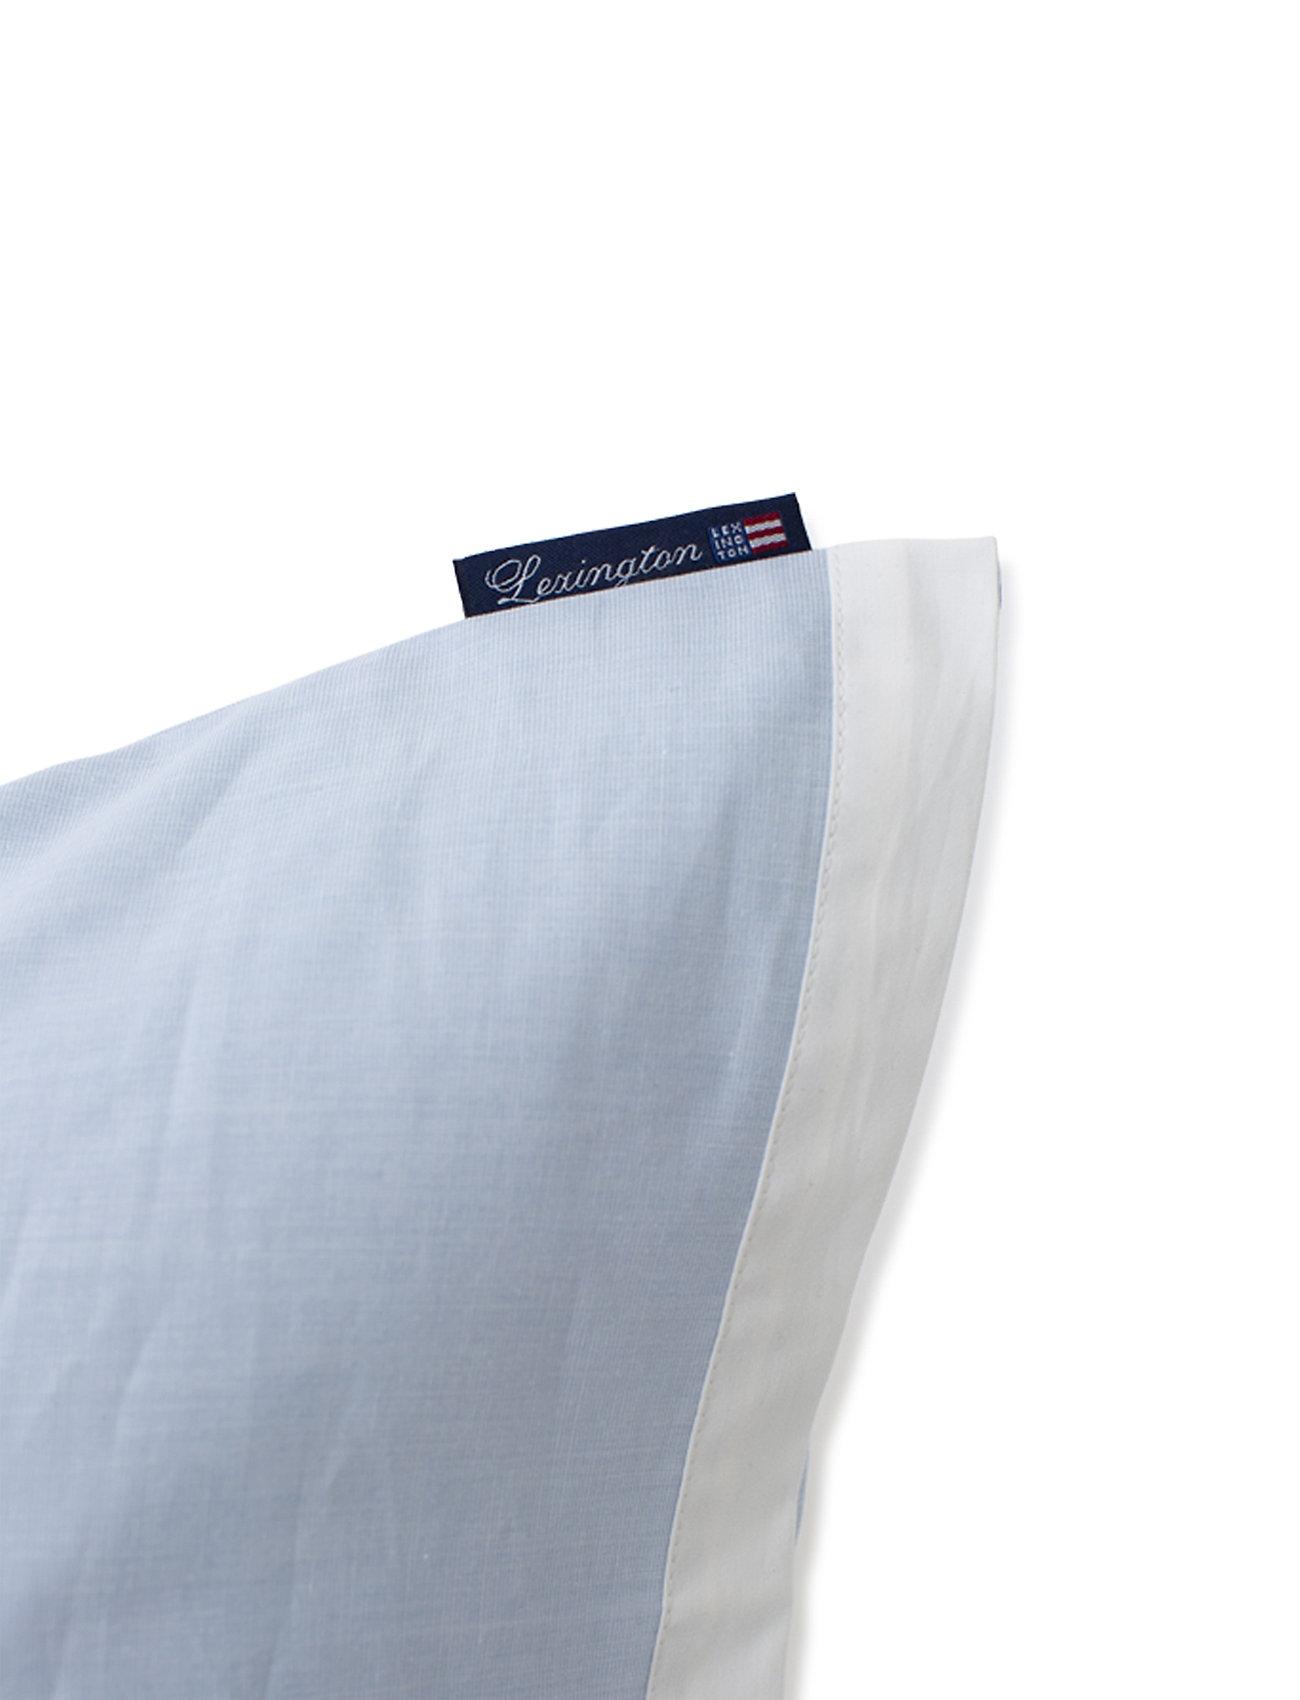 Lexington Home - Blue/White Contrast Cotton Chambray Pillowcase - pillowcases - blue/white - 1